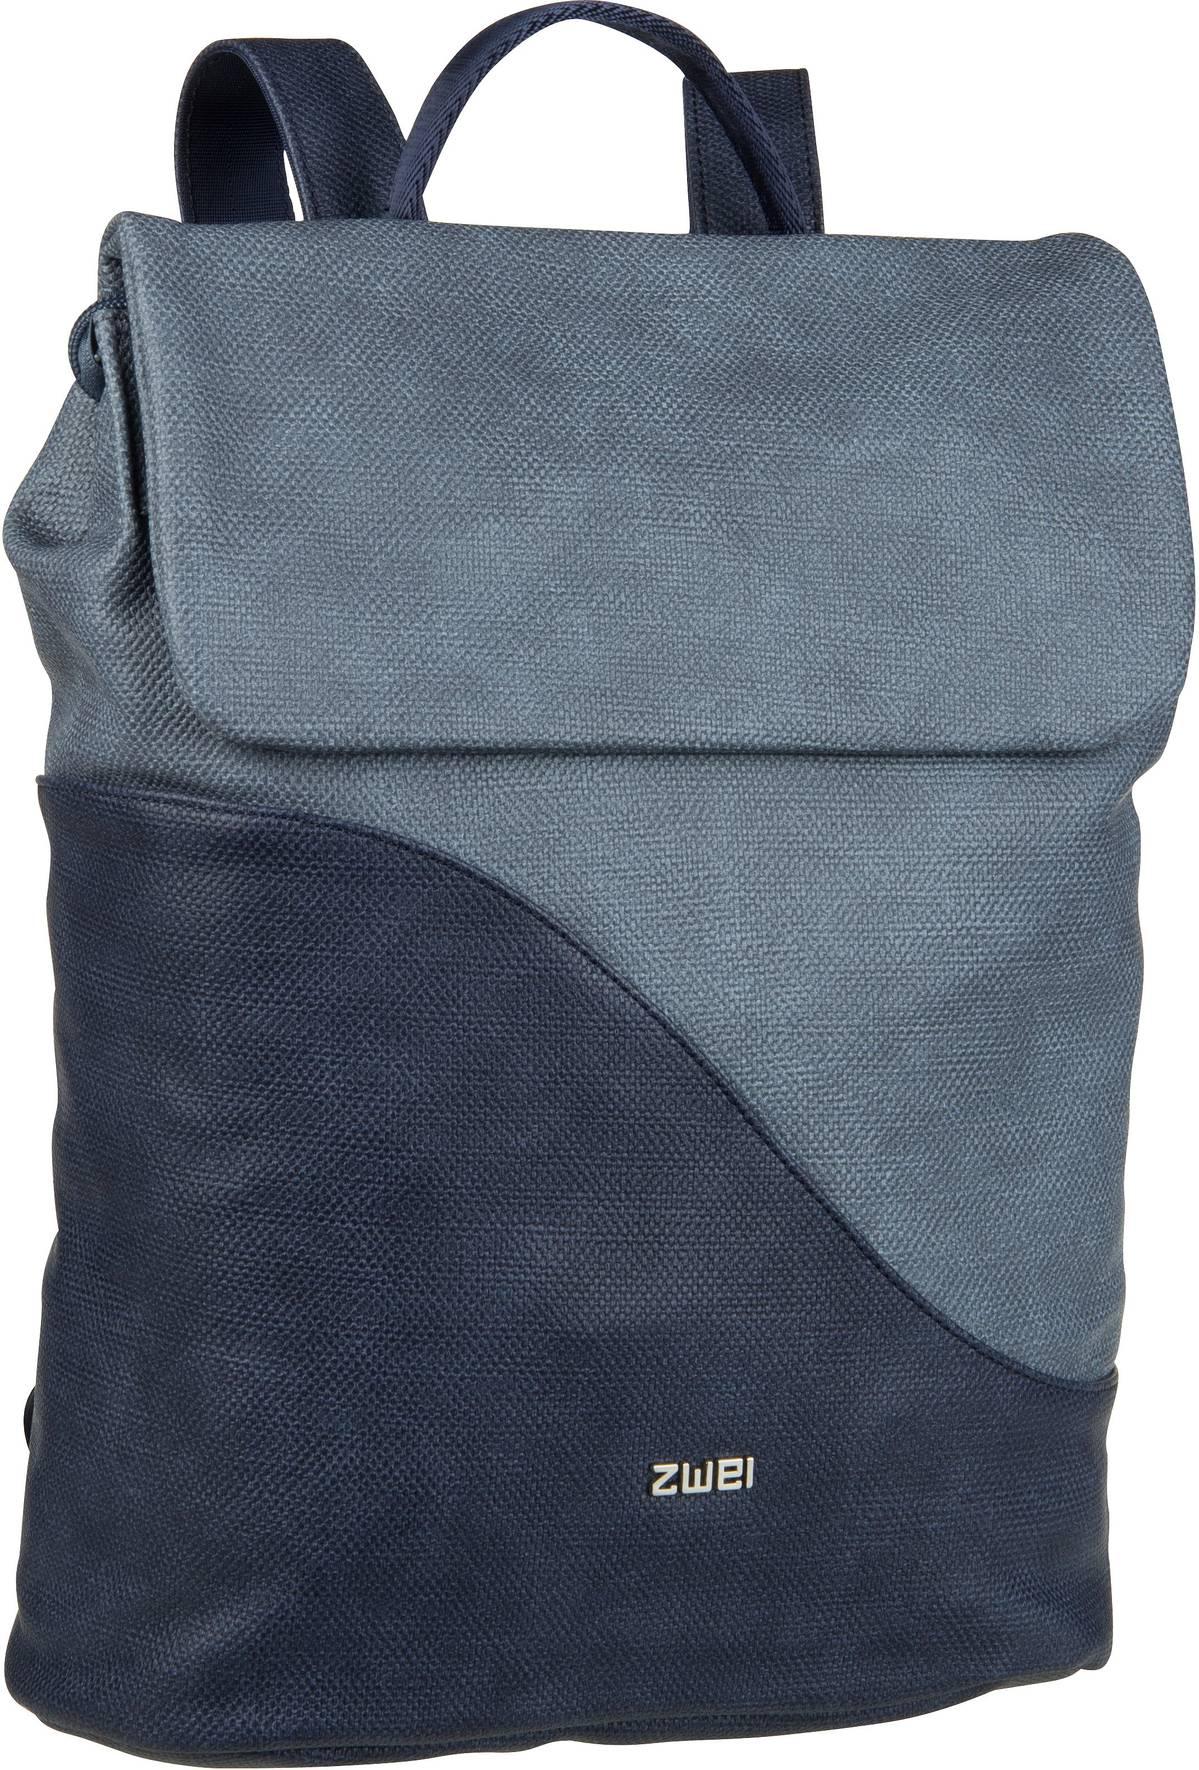 Rucksack / Daypack Cherie CHR13 Canvas/Blue (7 Liter)